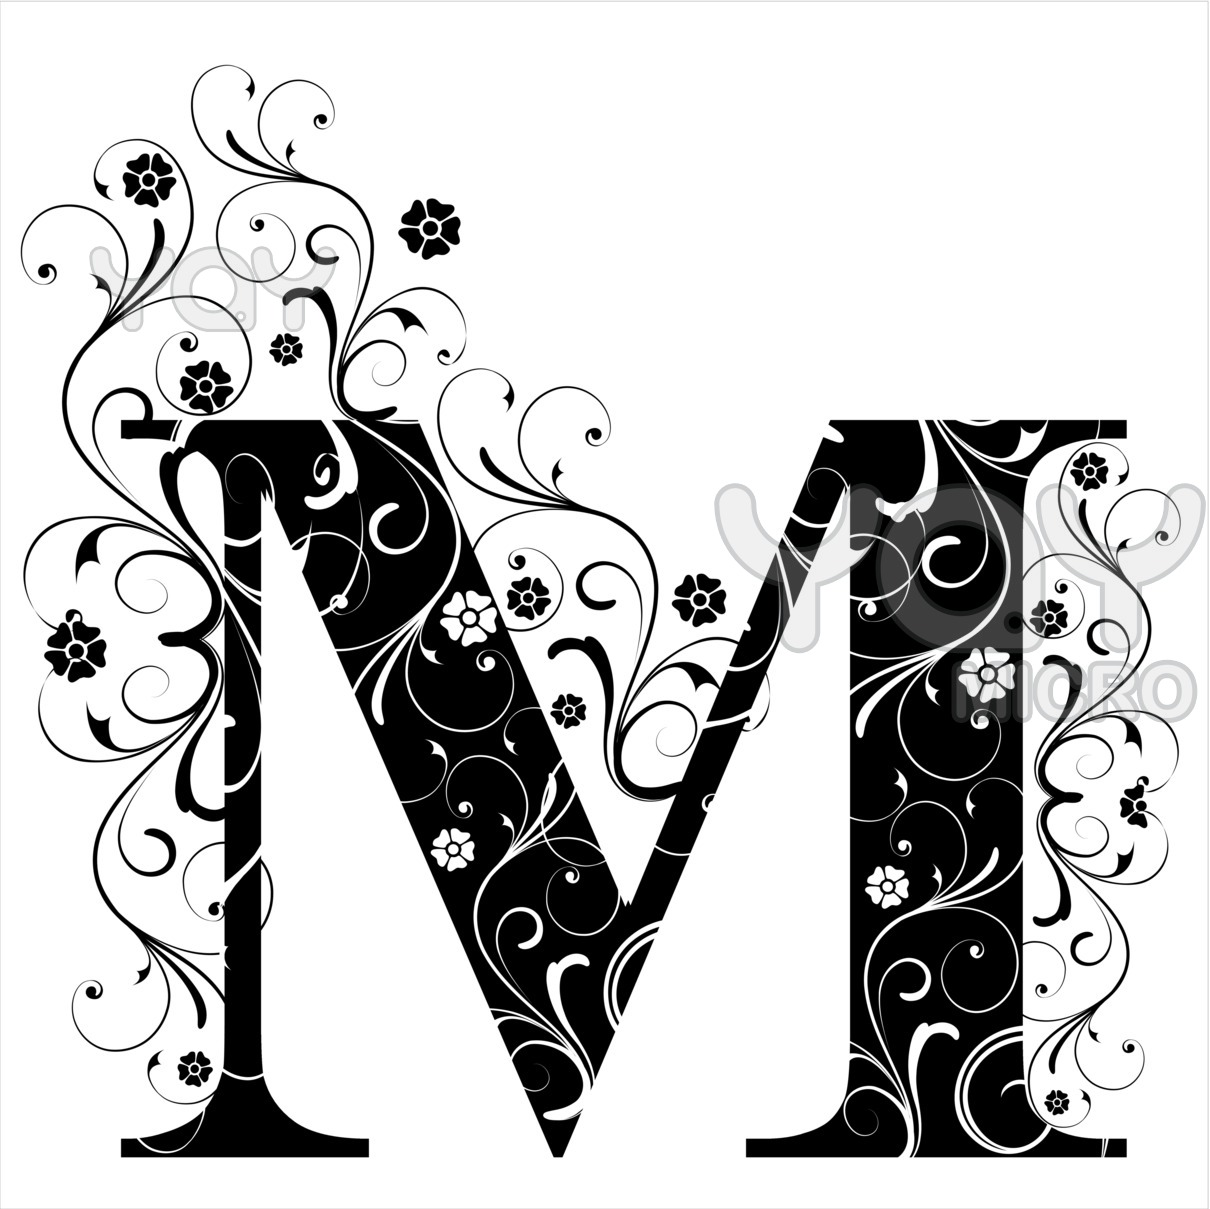 Tautogramma In M